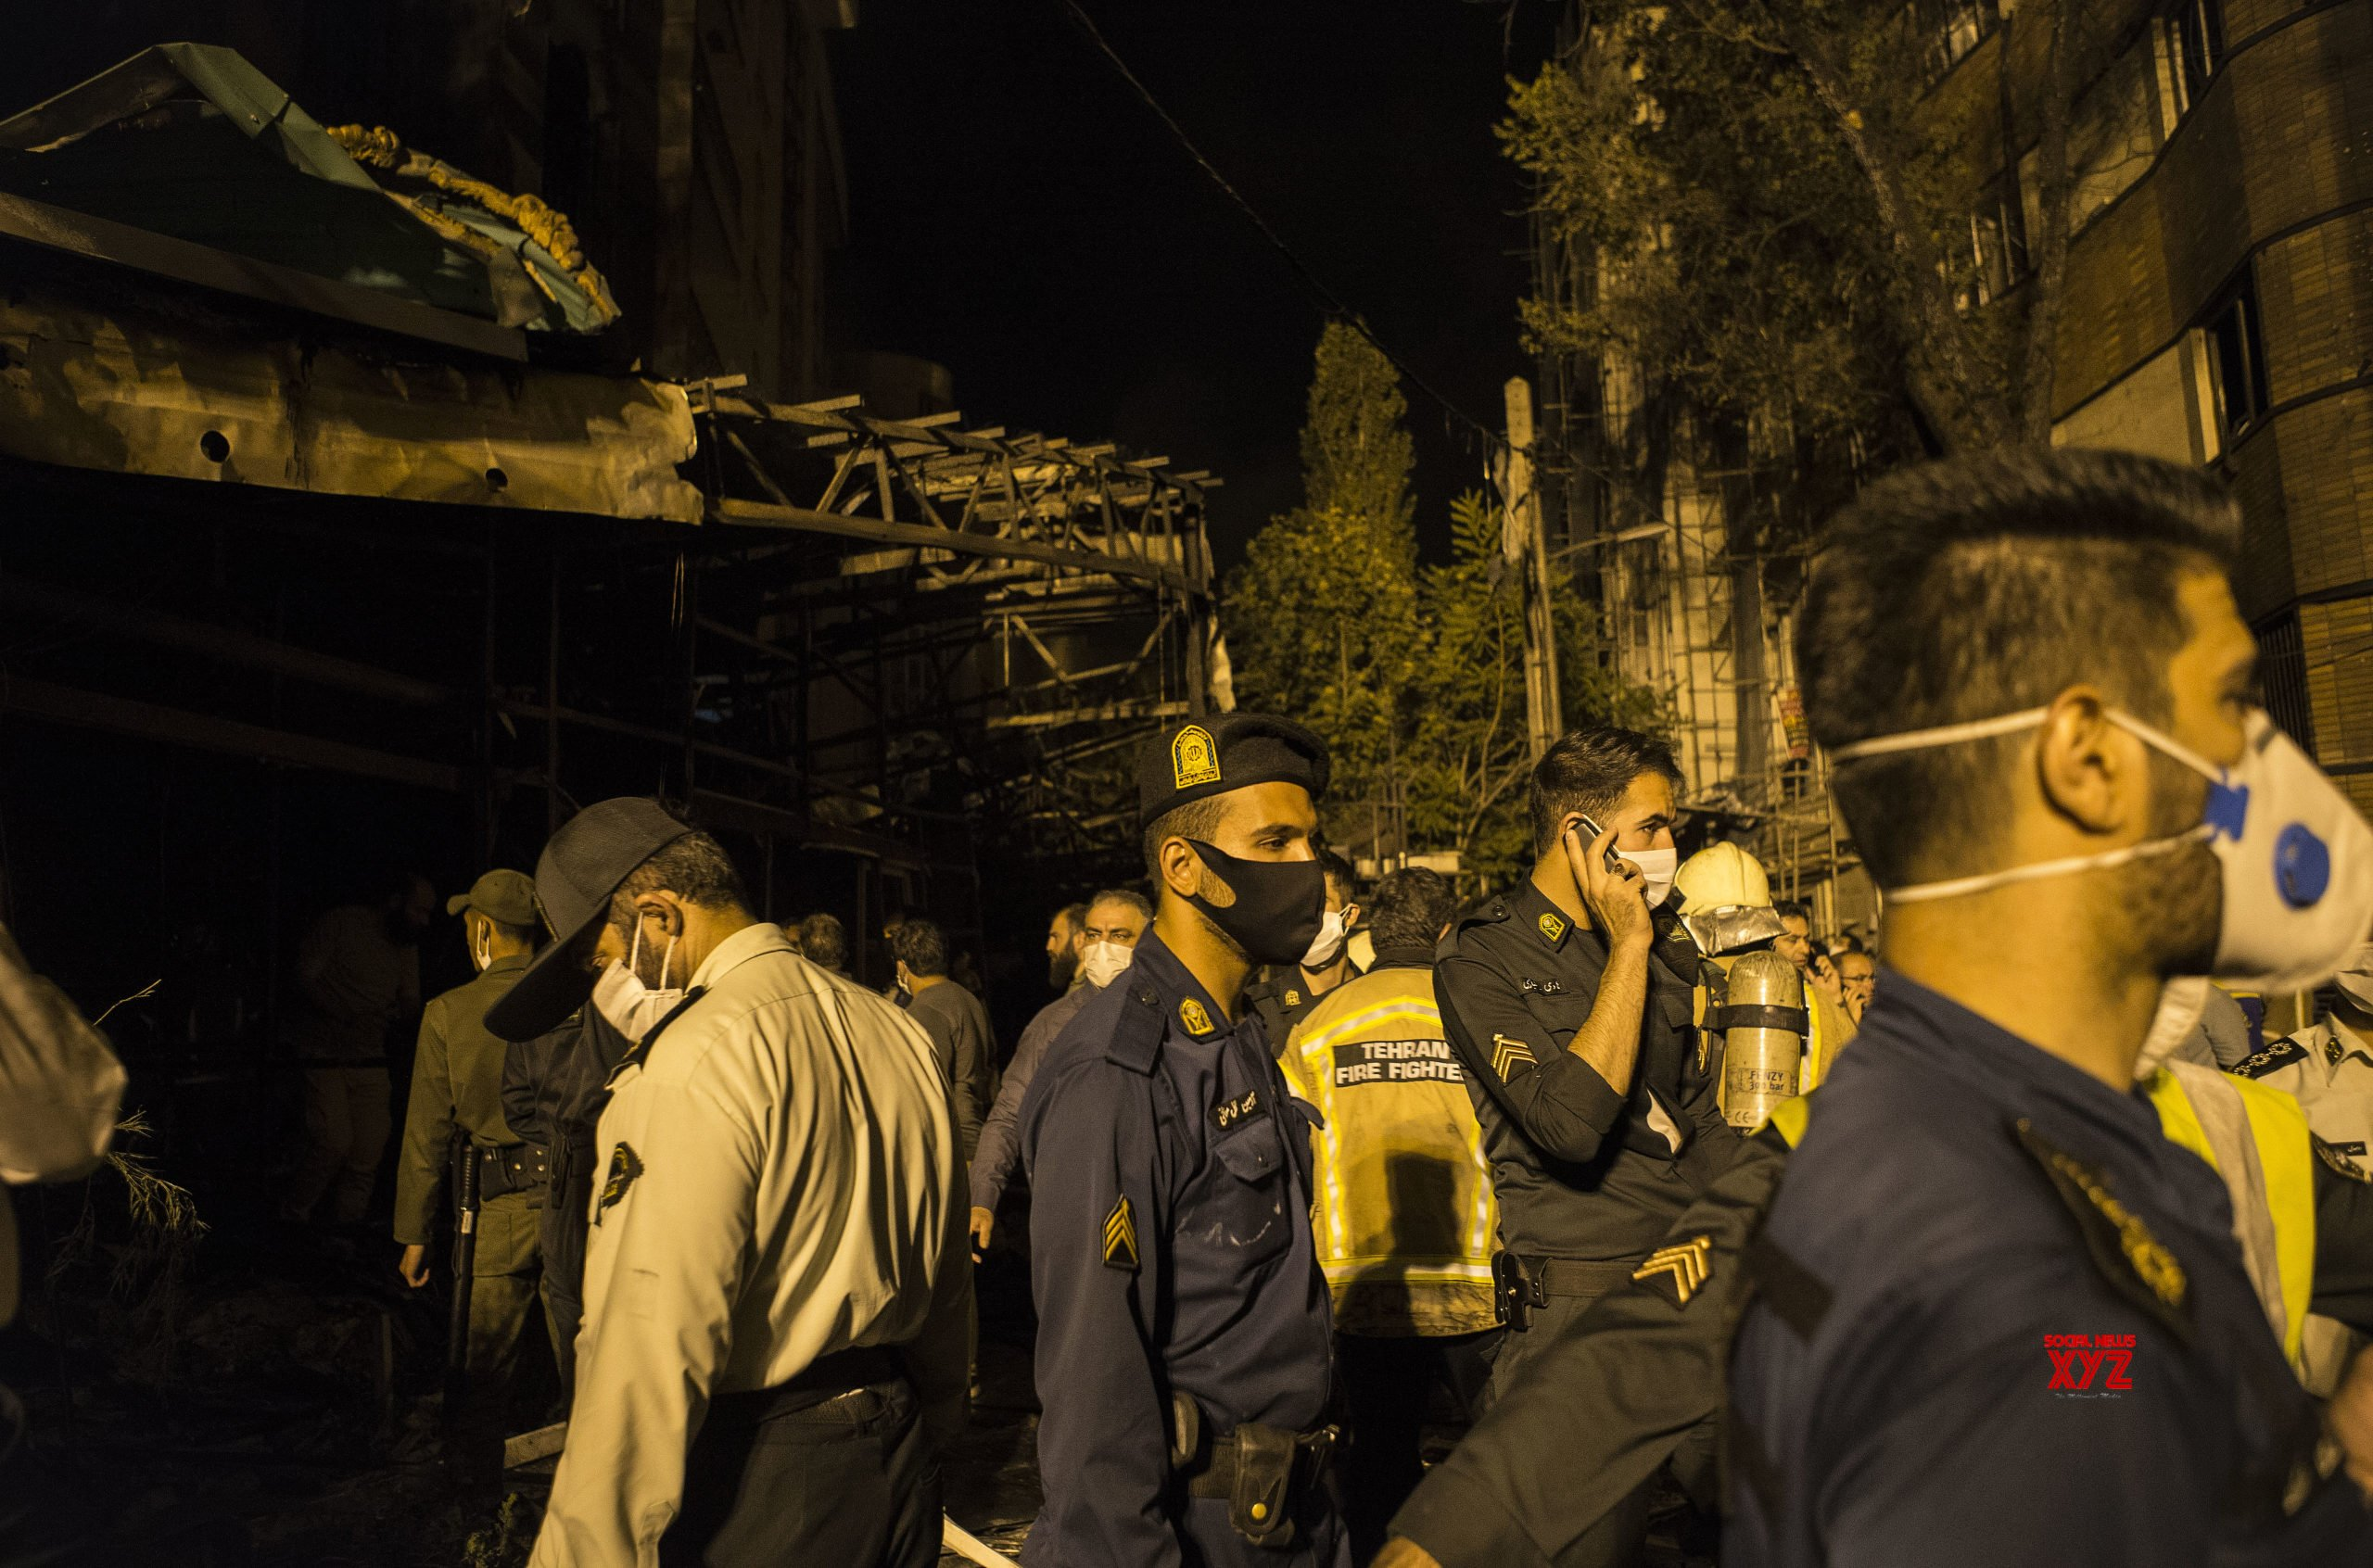 IRAN - TEHRAN - CLINIC - EXPLOSION #Gallery